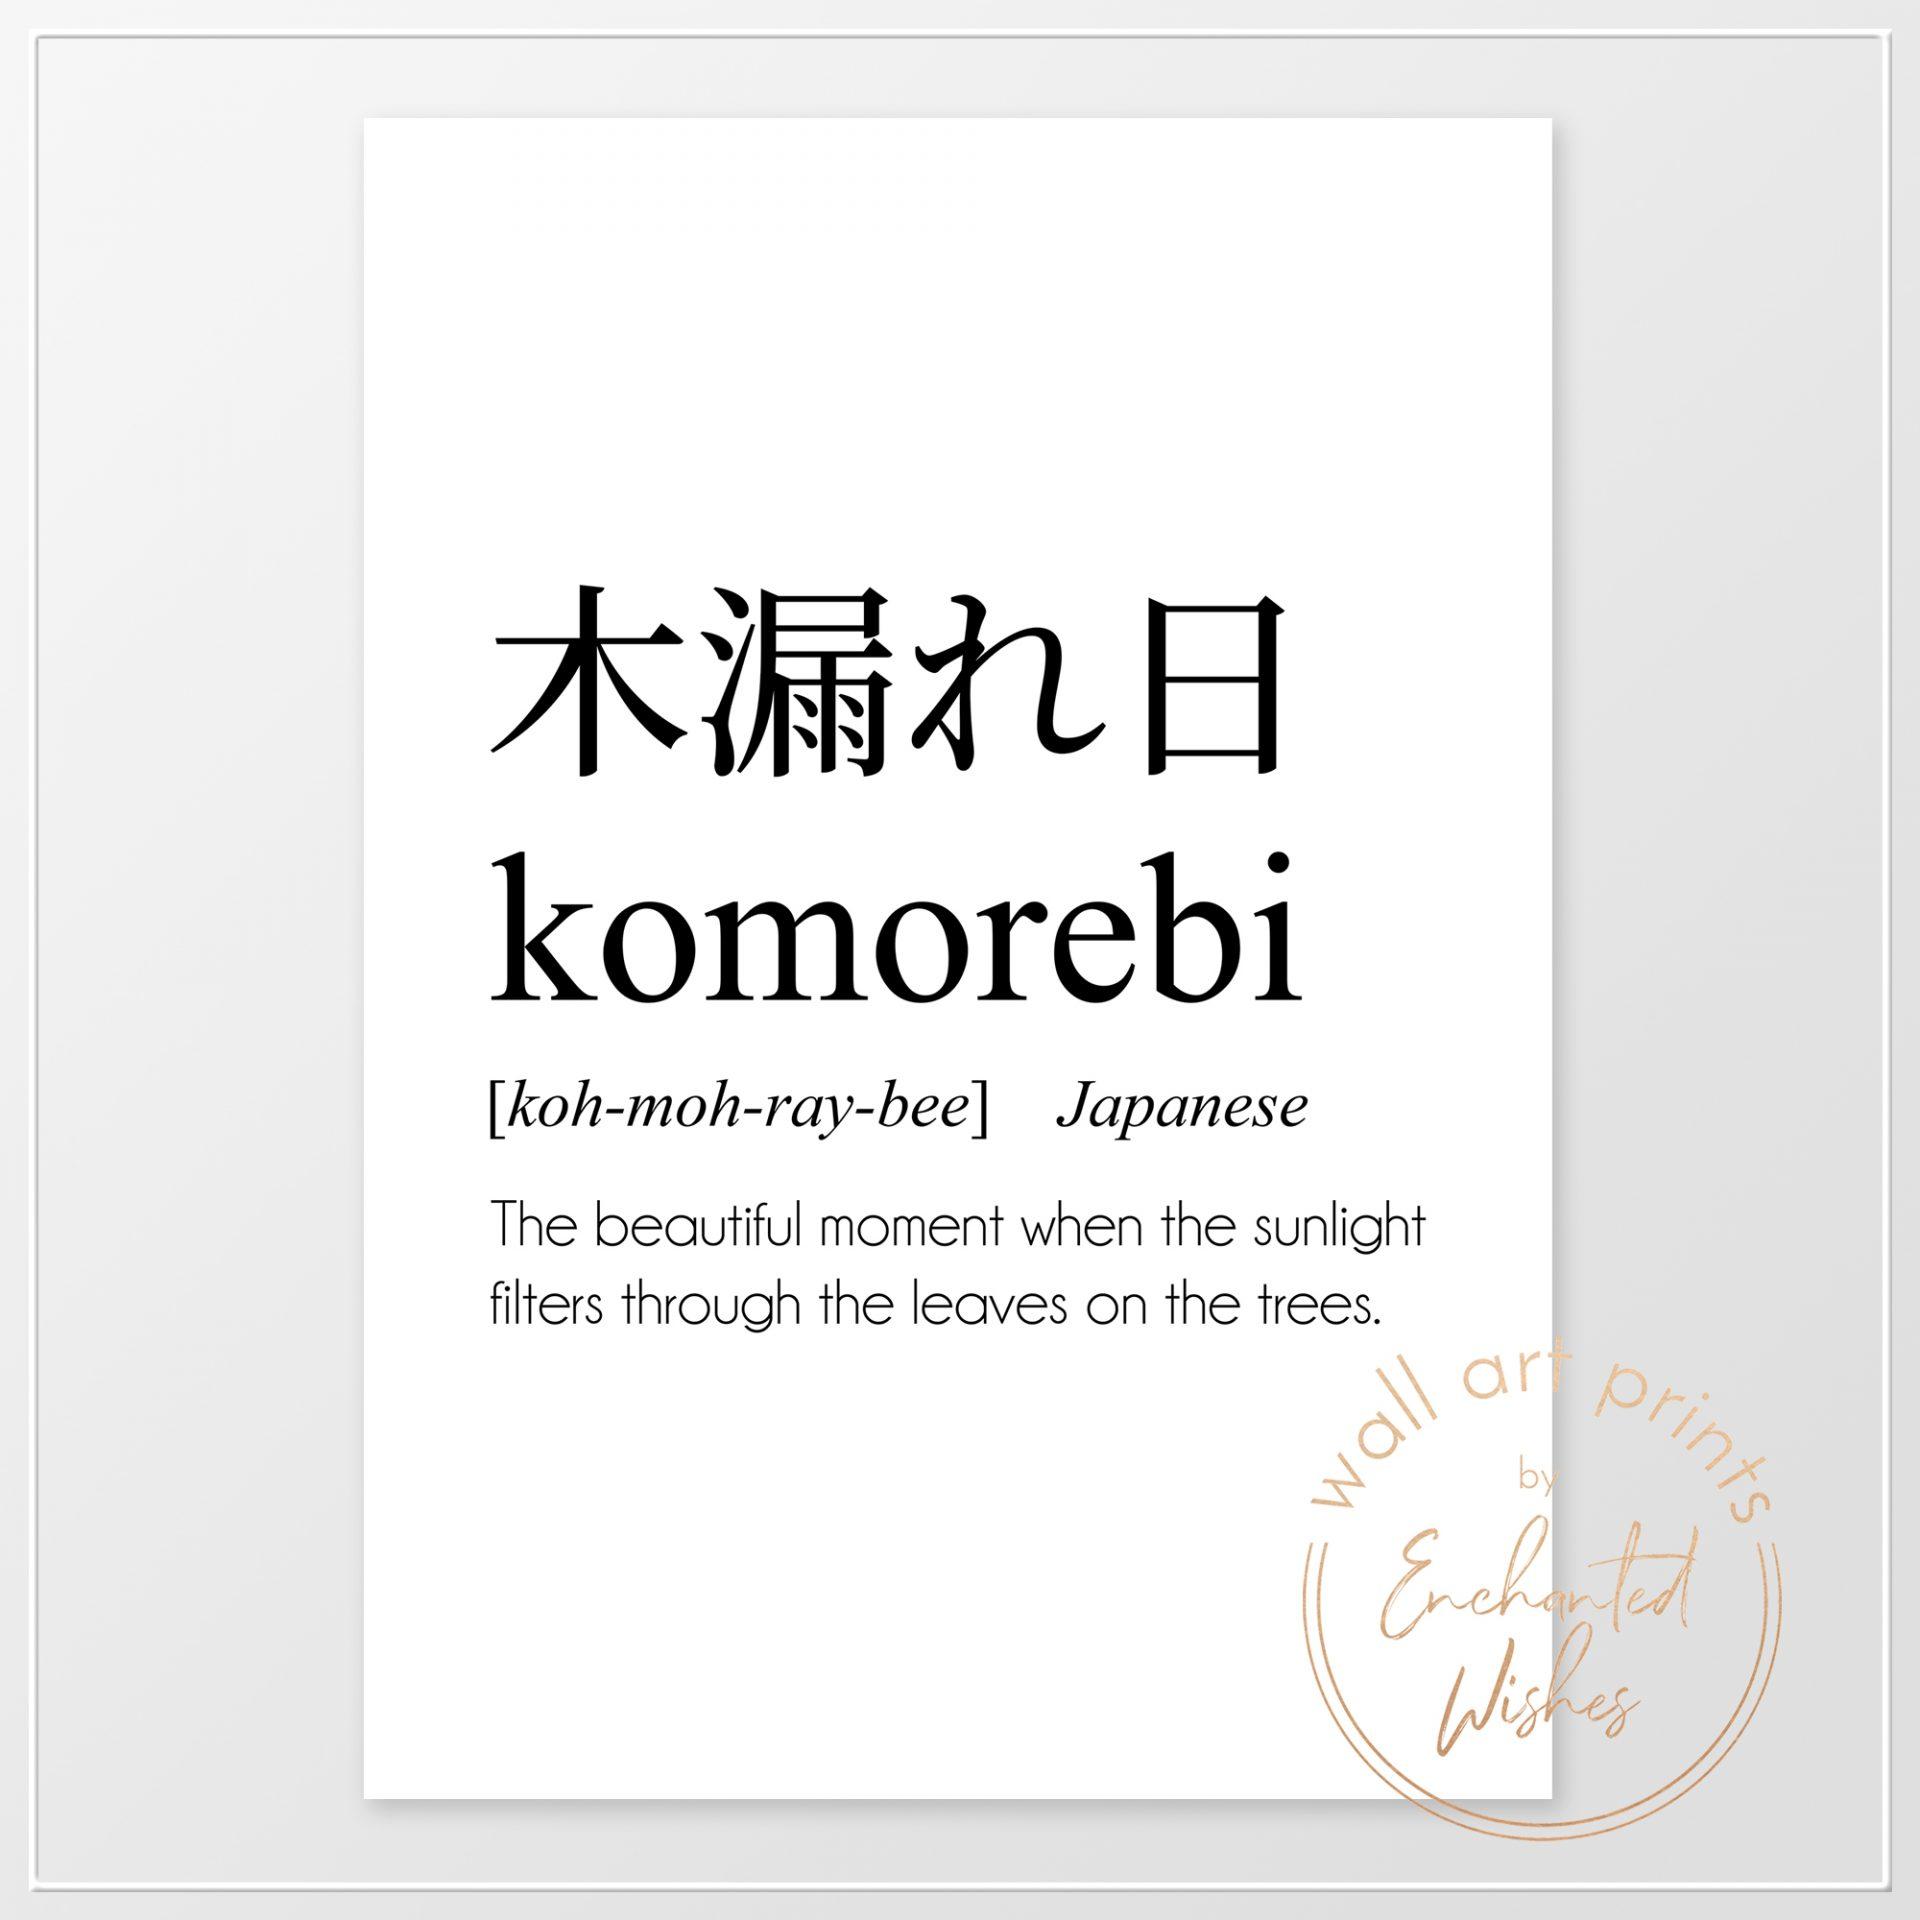 Komorebi definition print